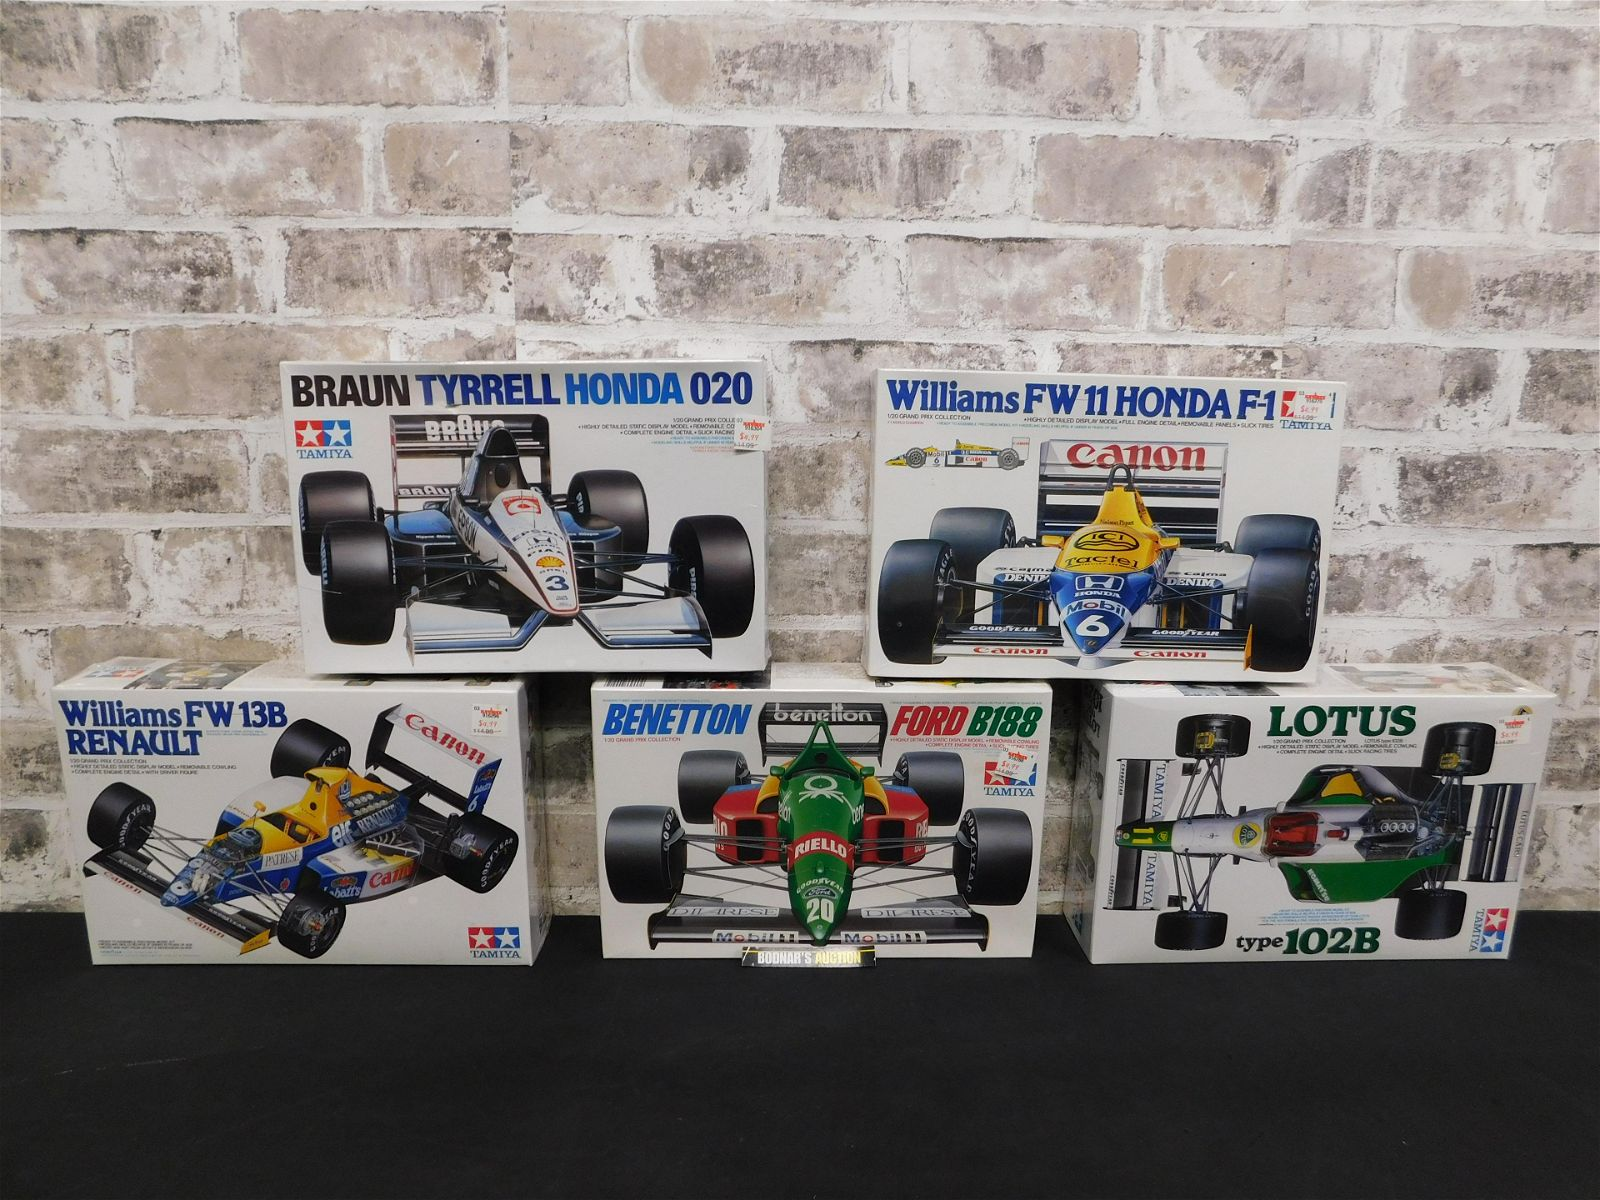 Lot of 5 Sealed Tamiya Grand Prix Model Kits